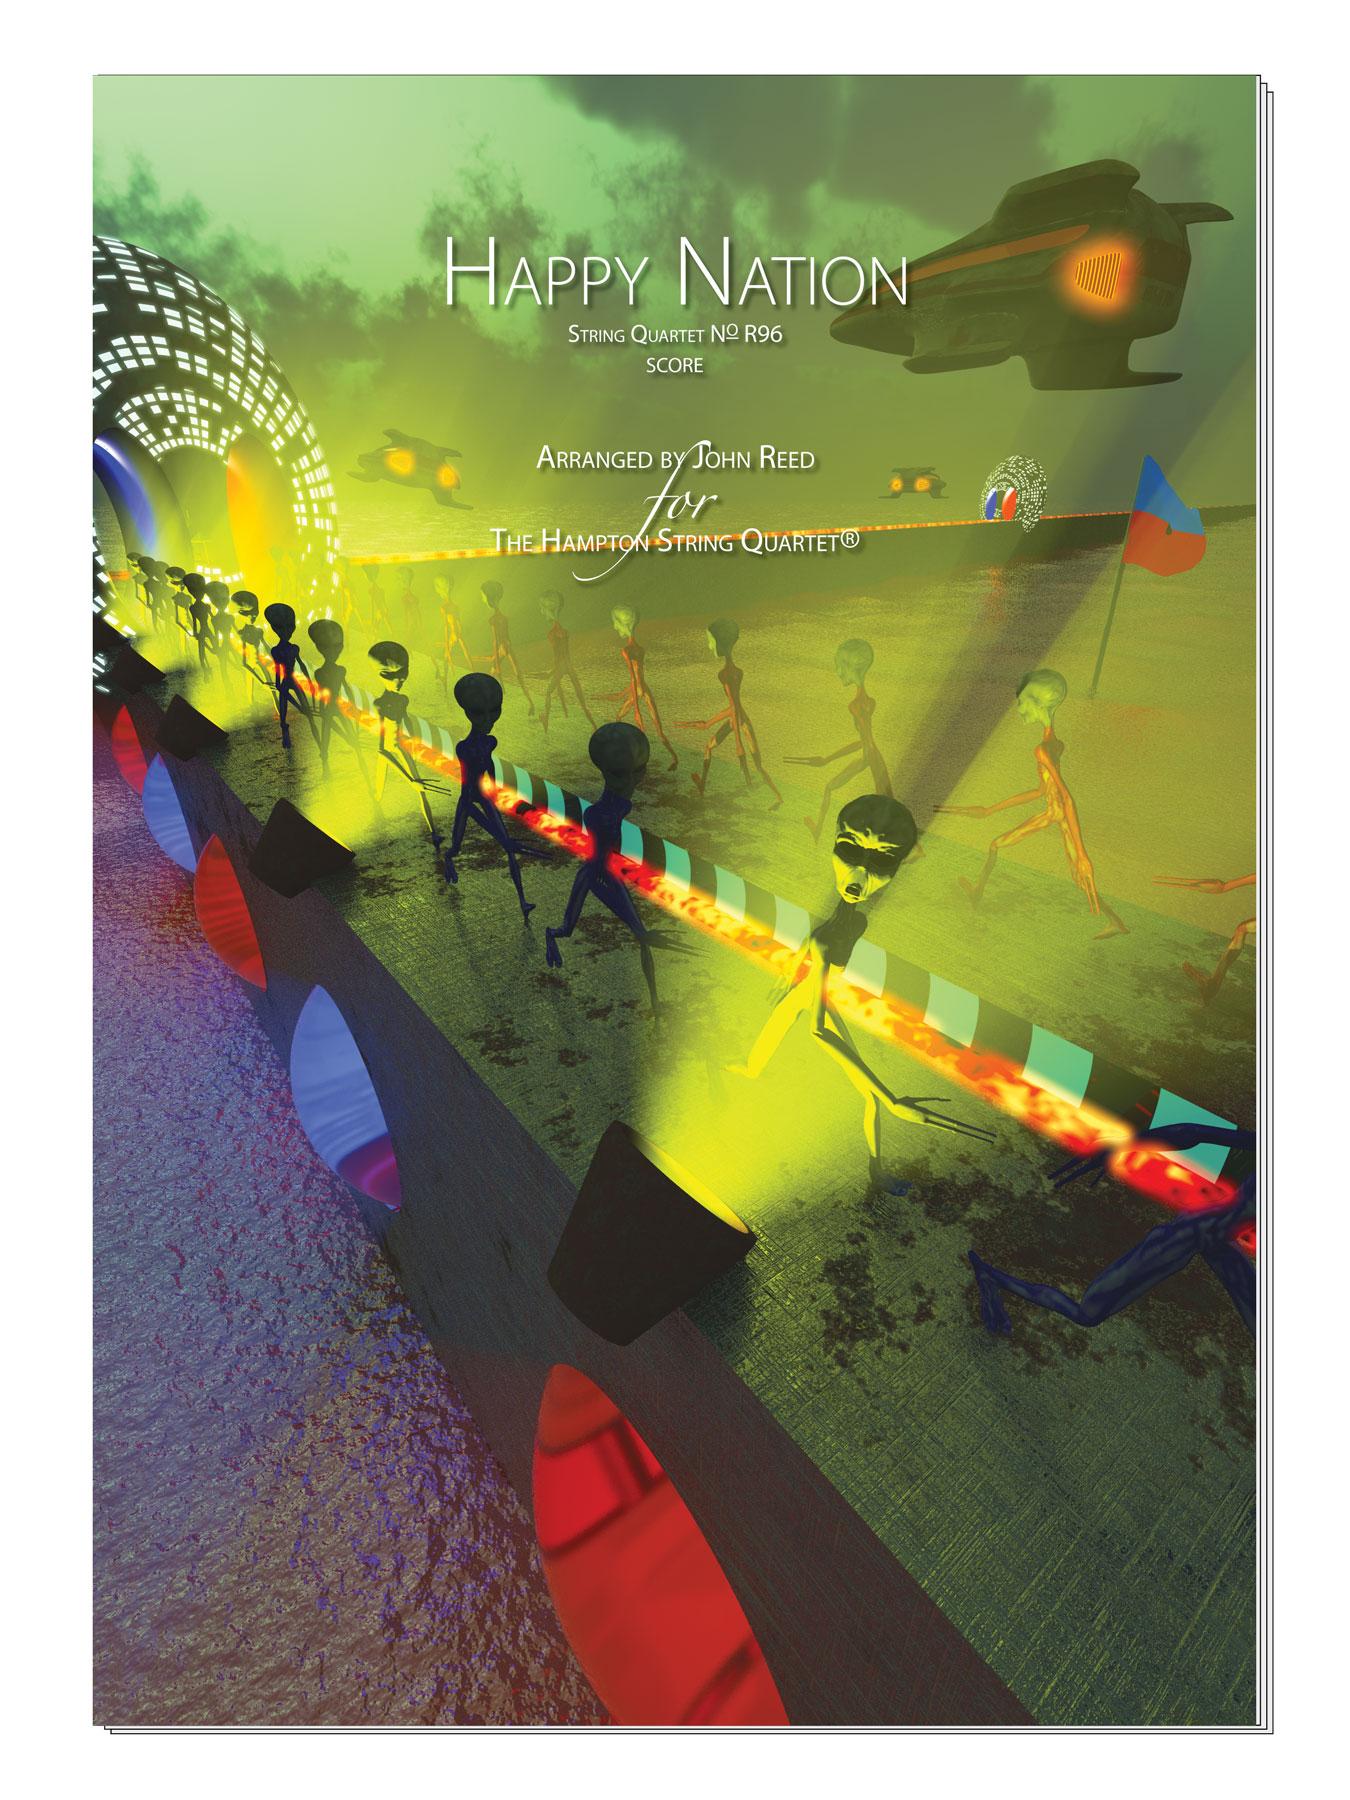 HappyNation.jpg